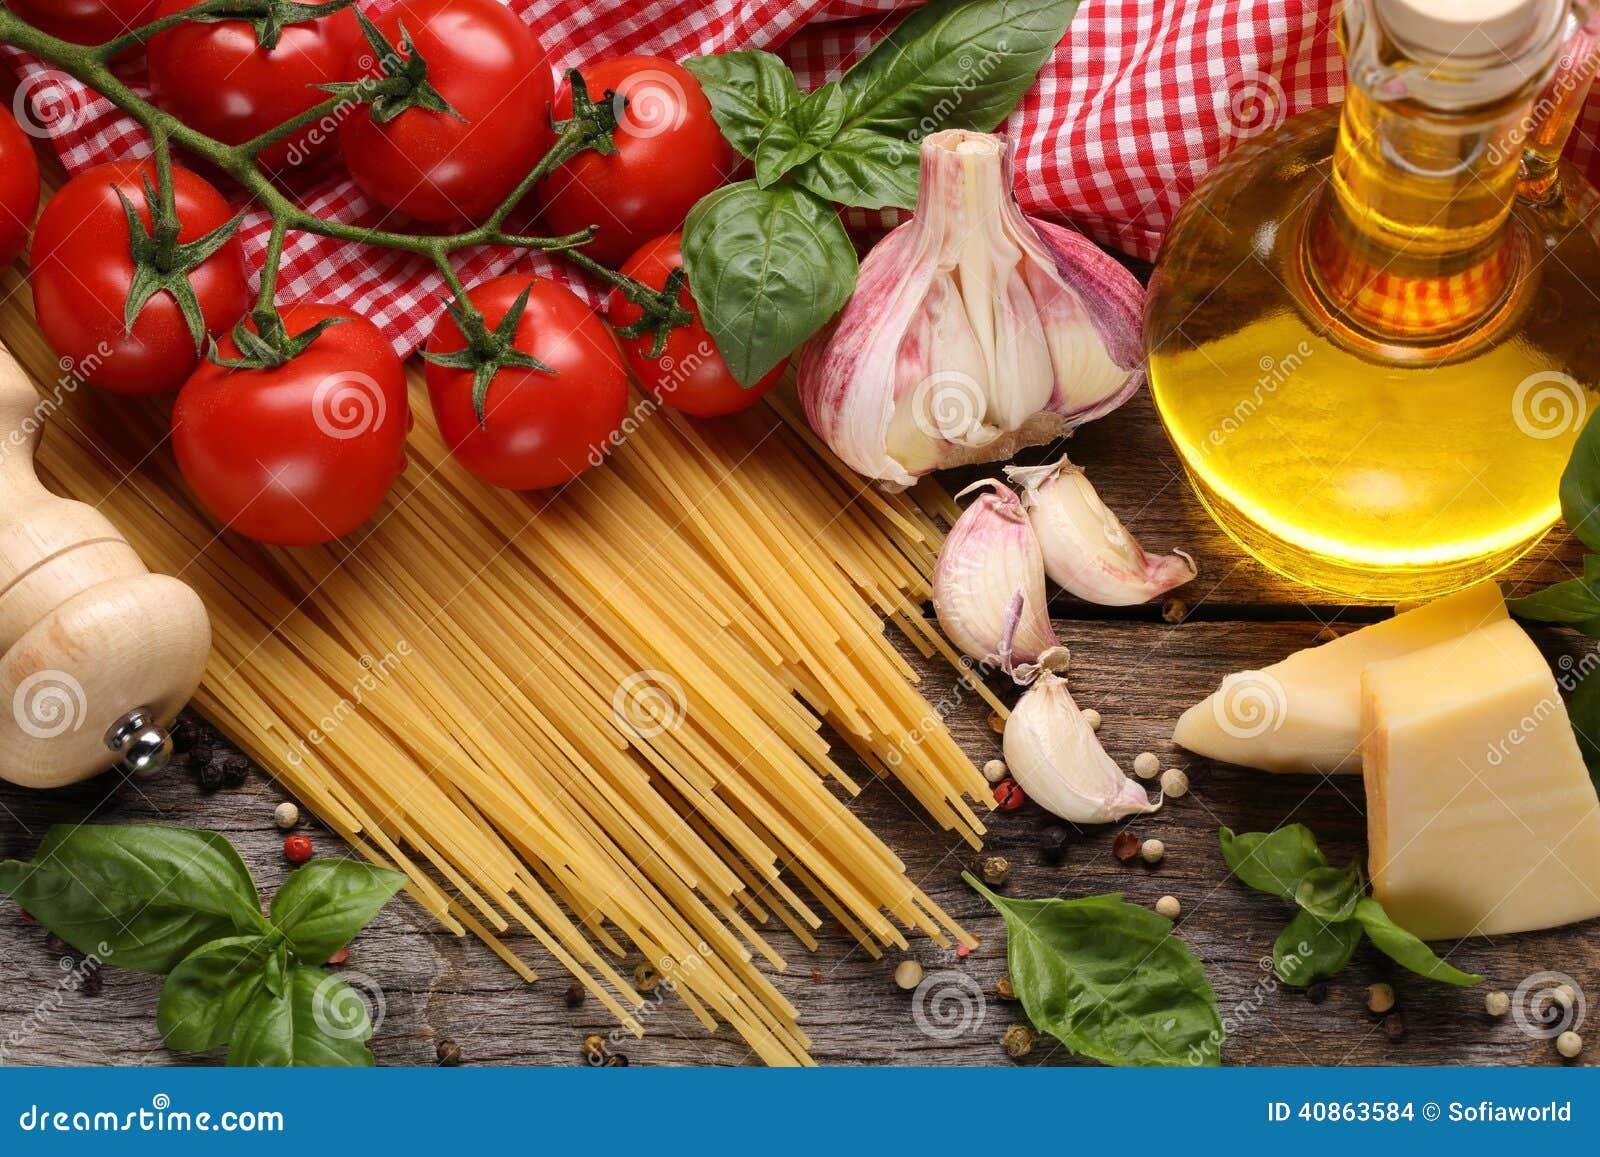 Italian food ingredients stock photo image of food cloth 40863584 italian food ingredients cloth cuisine forumfinder Gallery